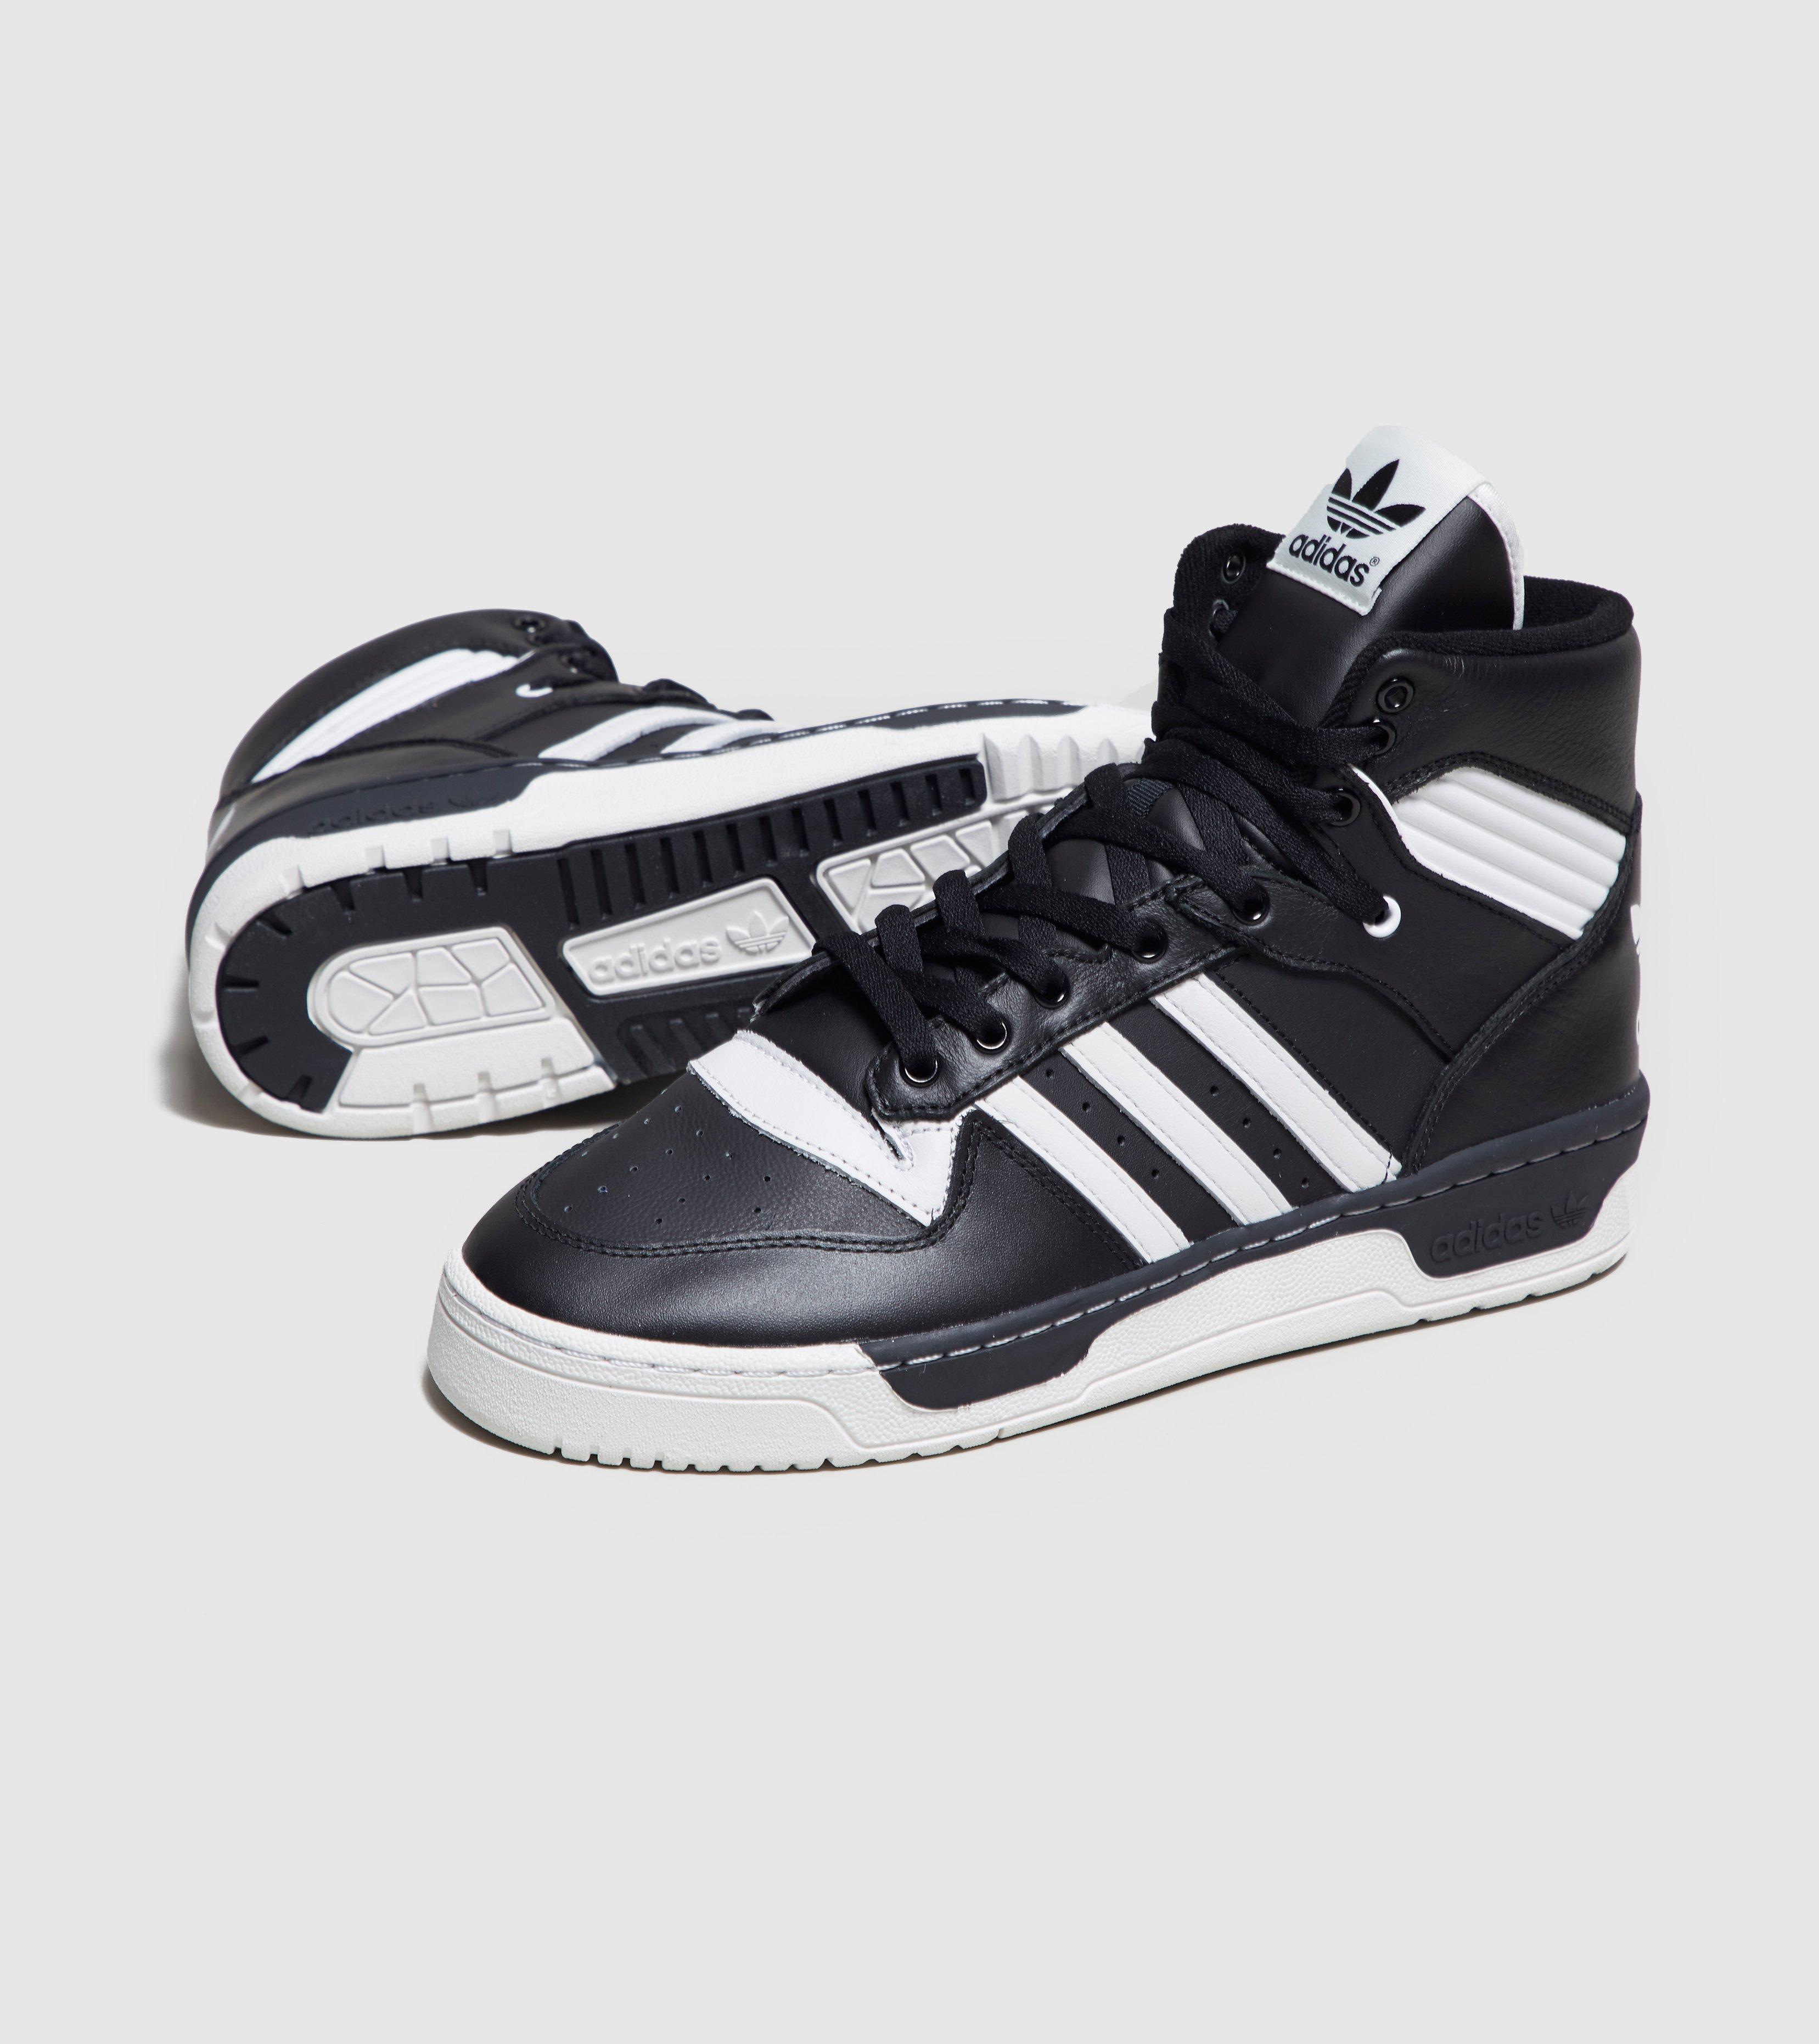 Lyst - adidas Originals Rivalry Hi in White for Men db55831cd2d2